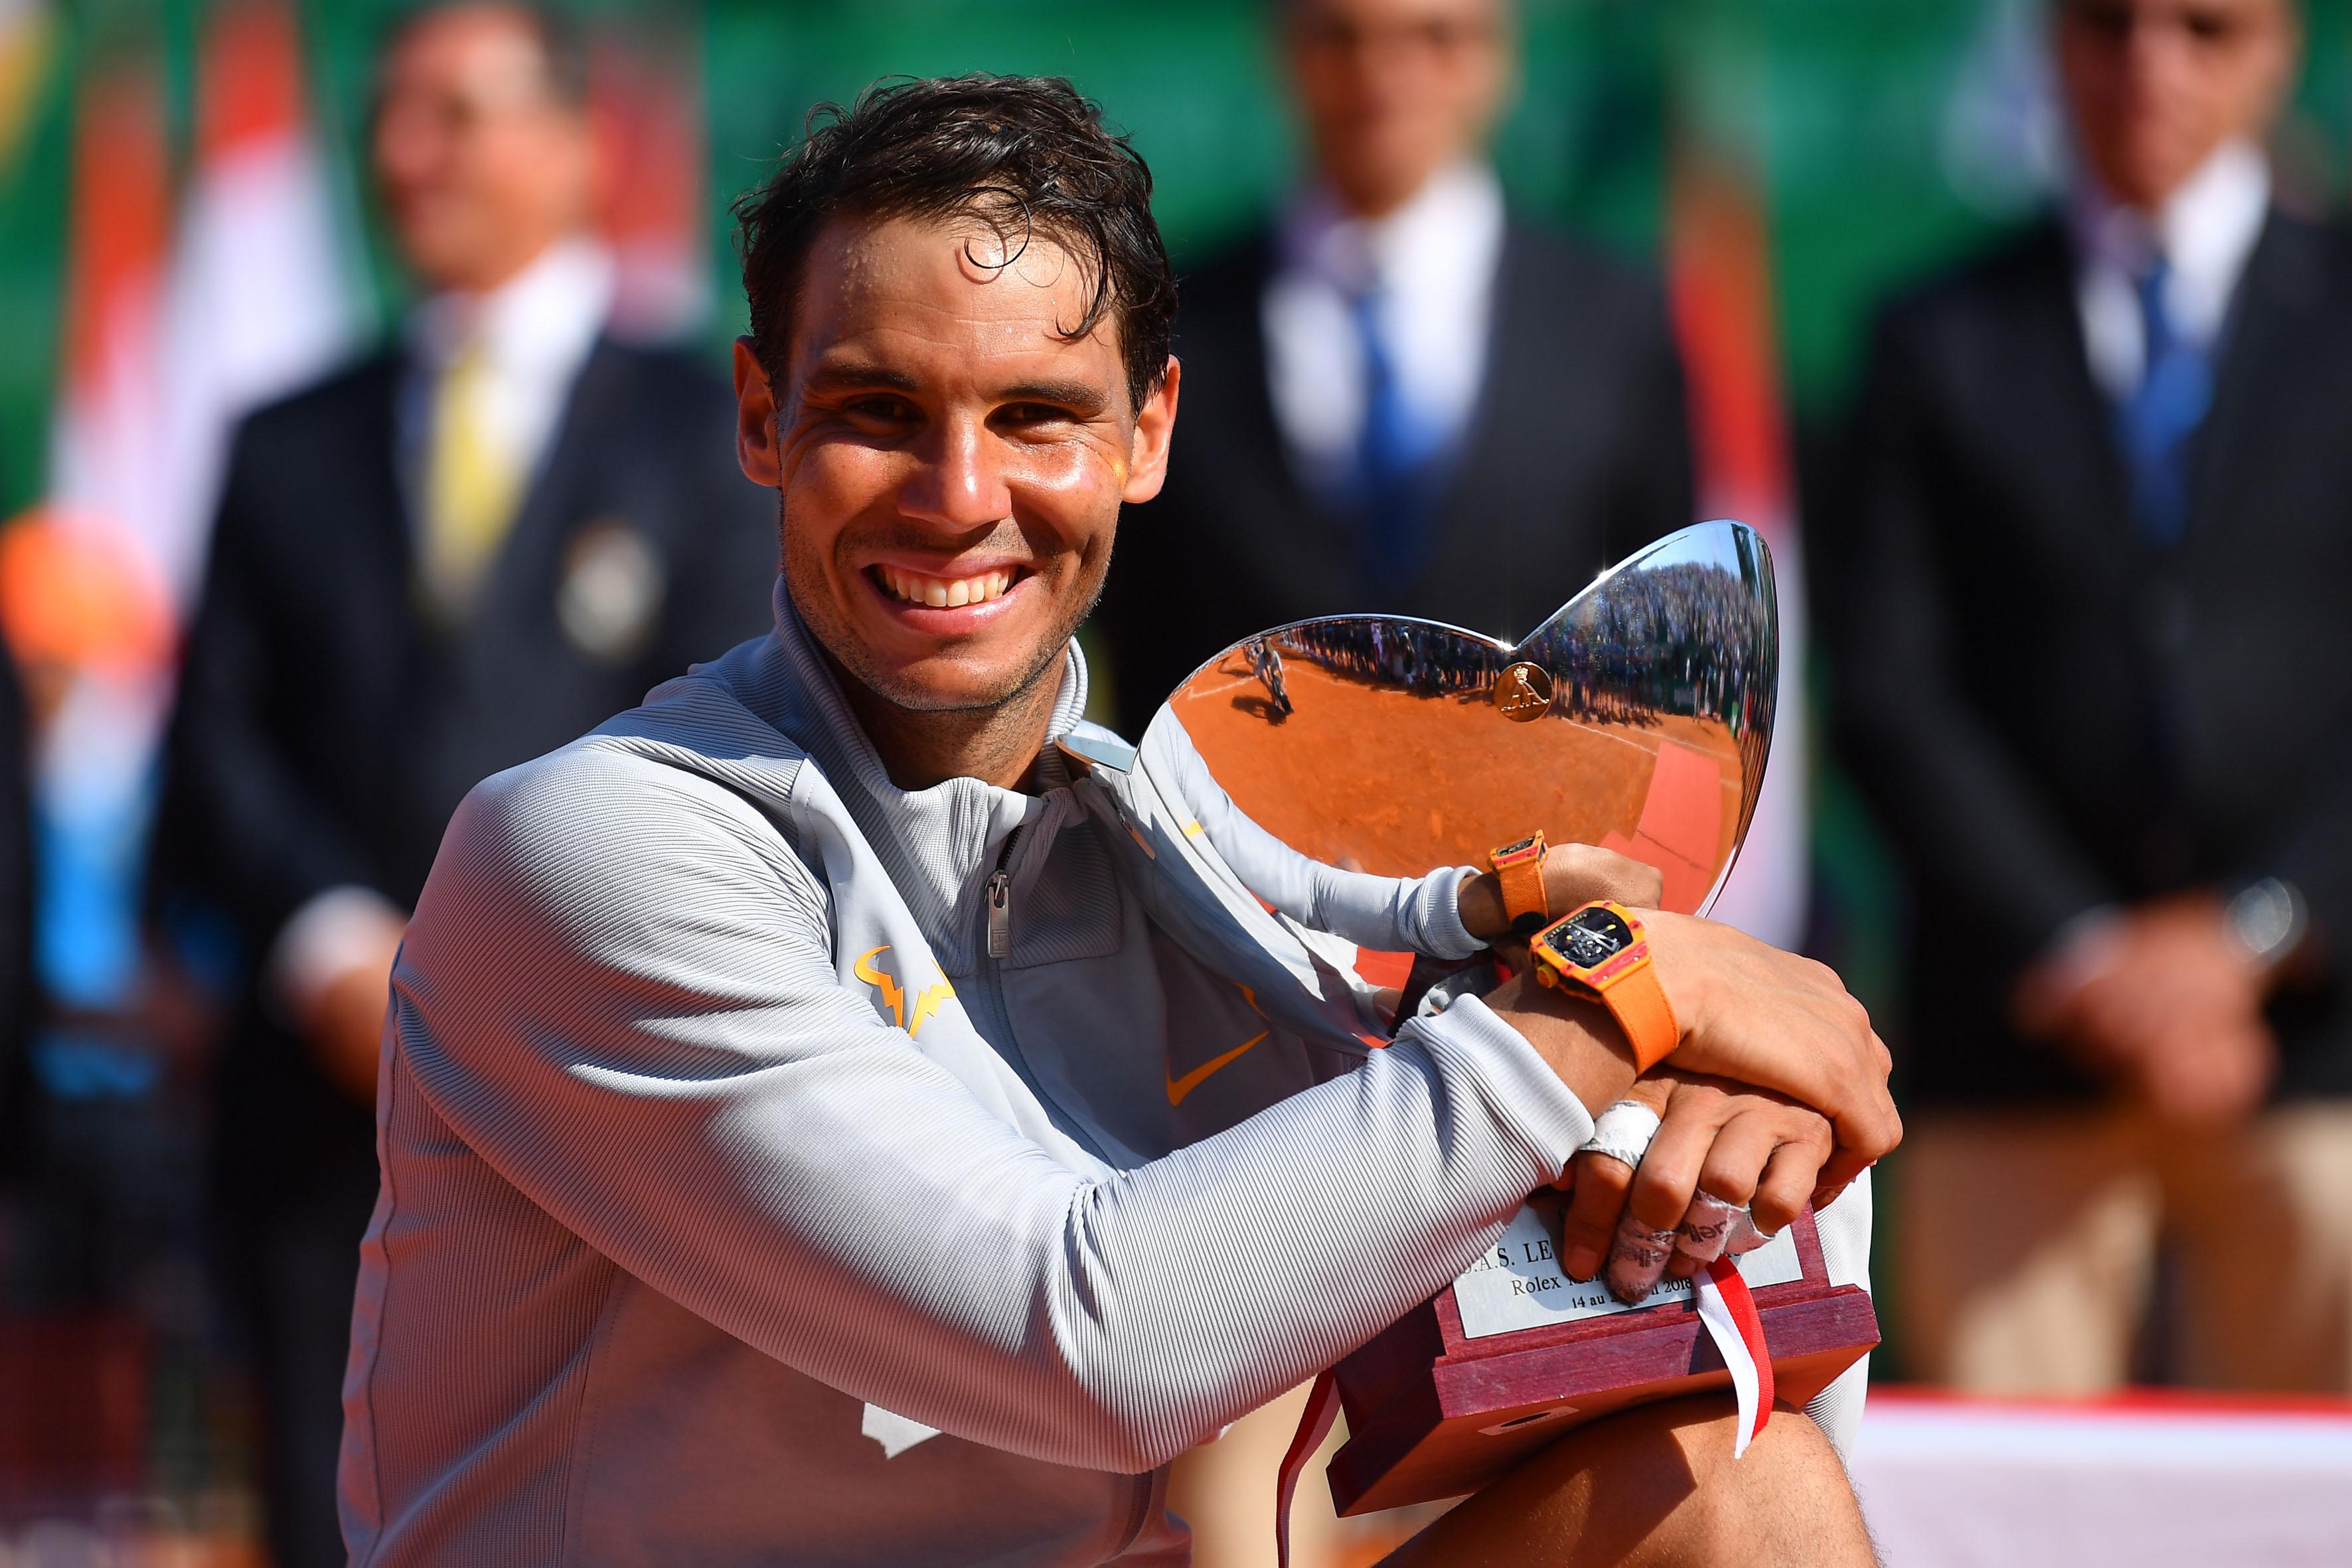 Tennis - ATP - Rafael Nadal plus que jamais seul sur terre